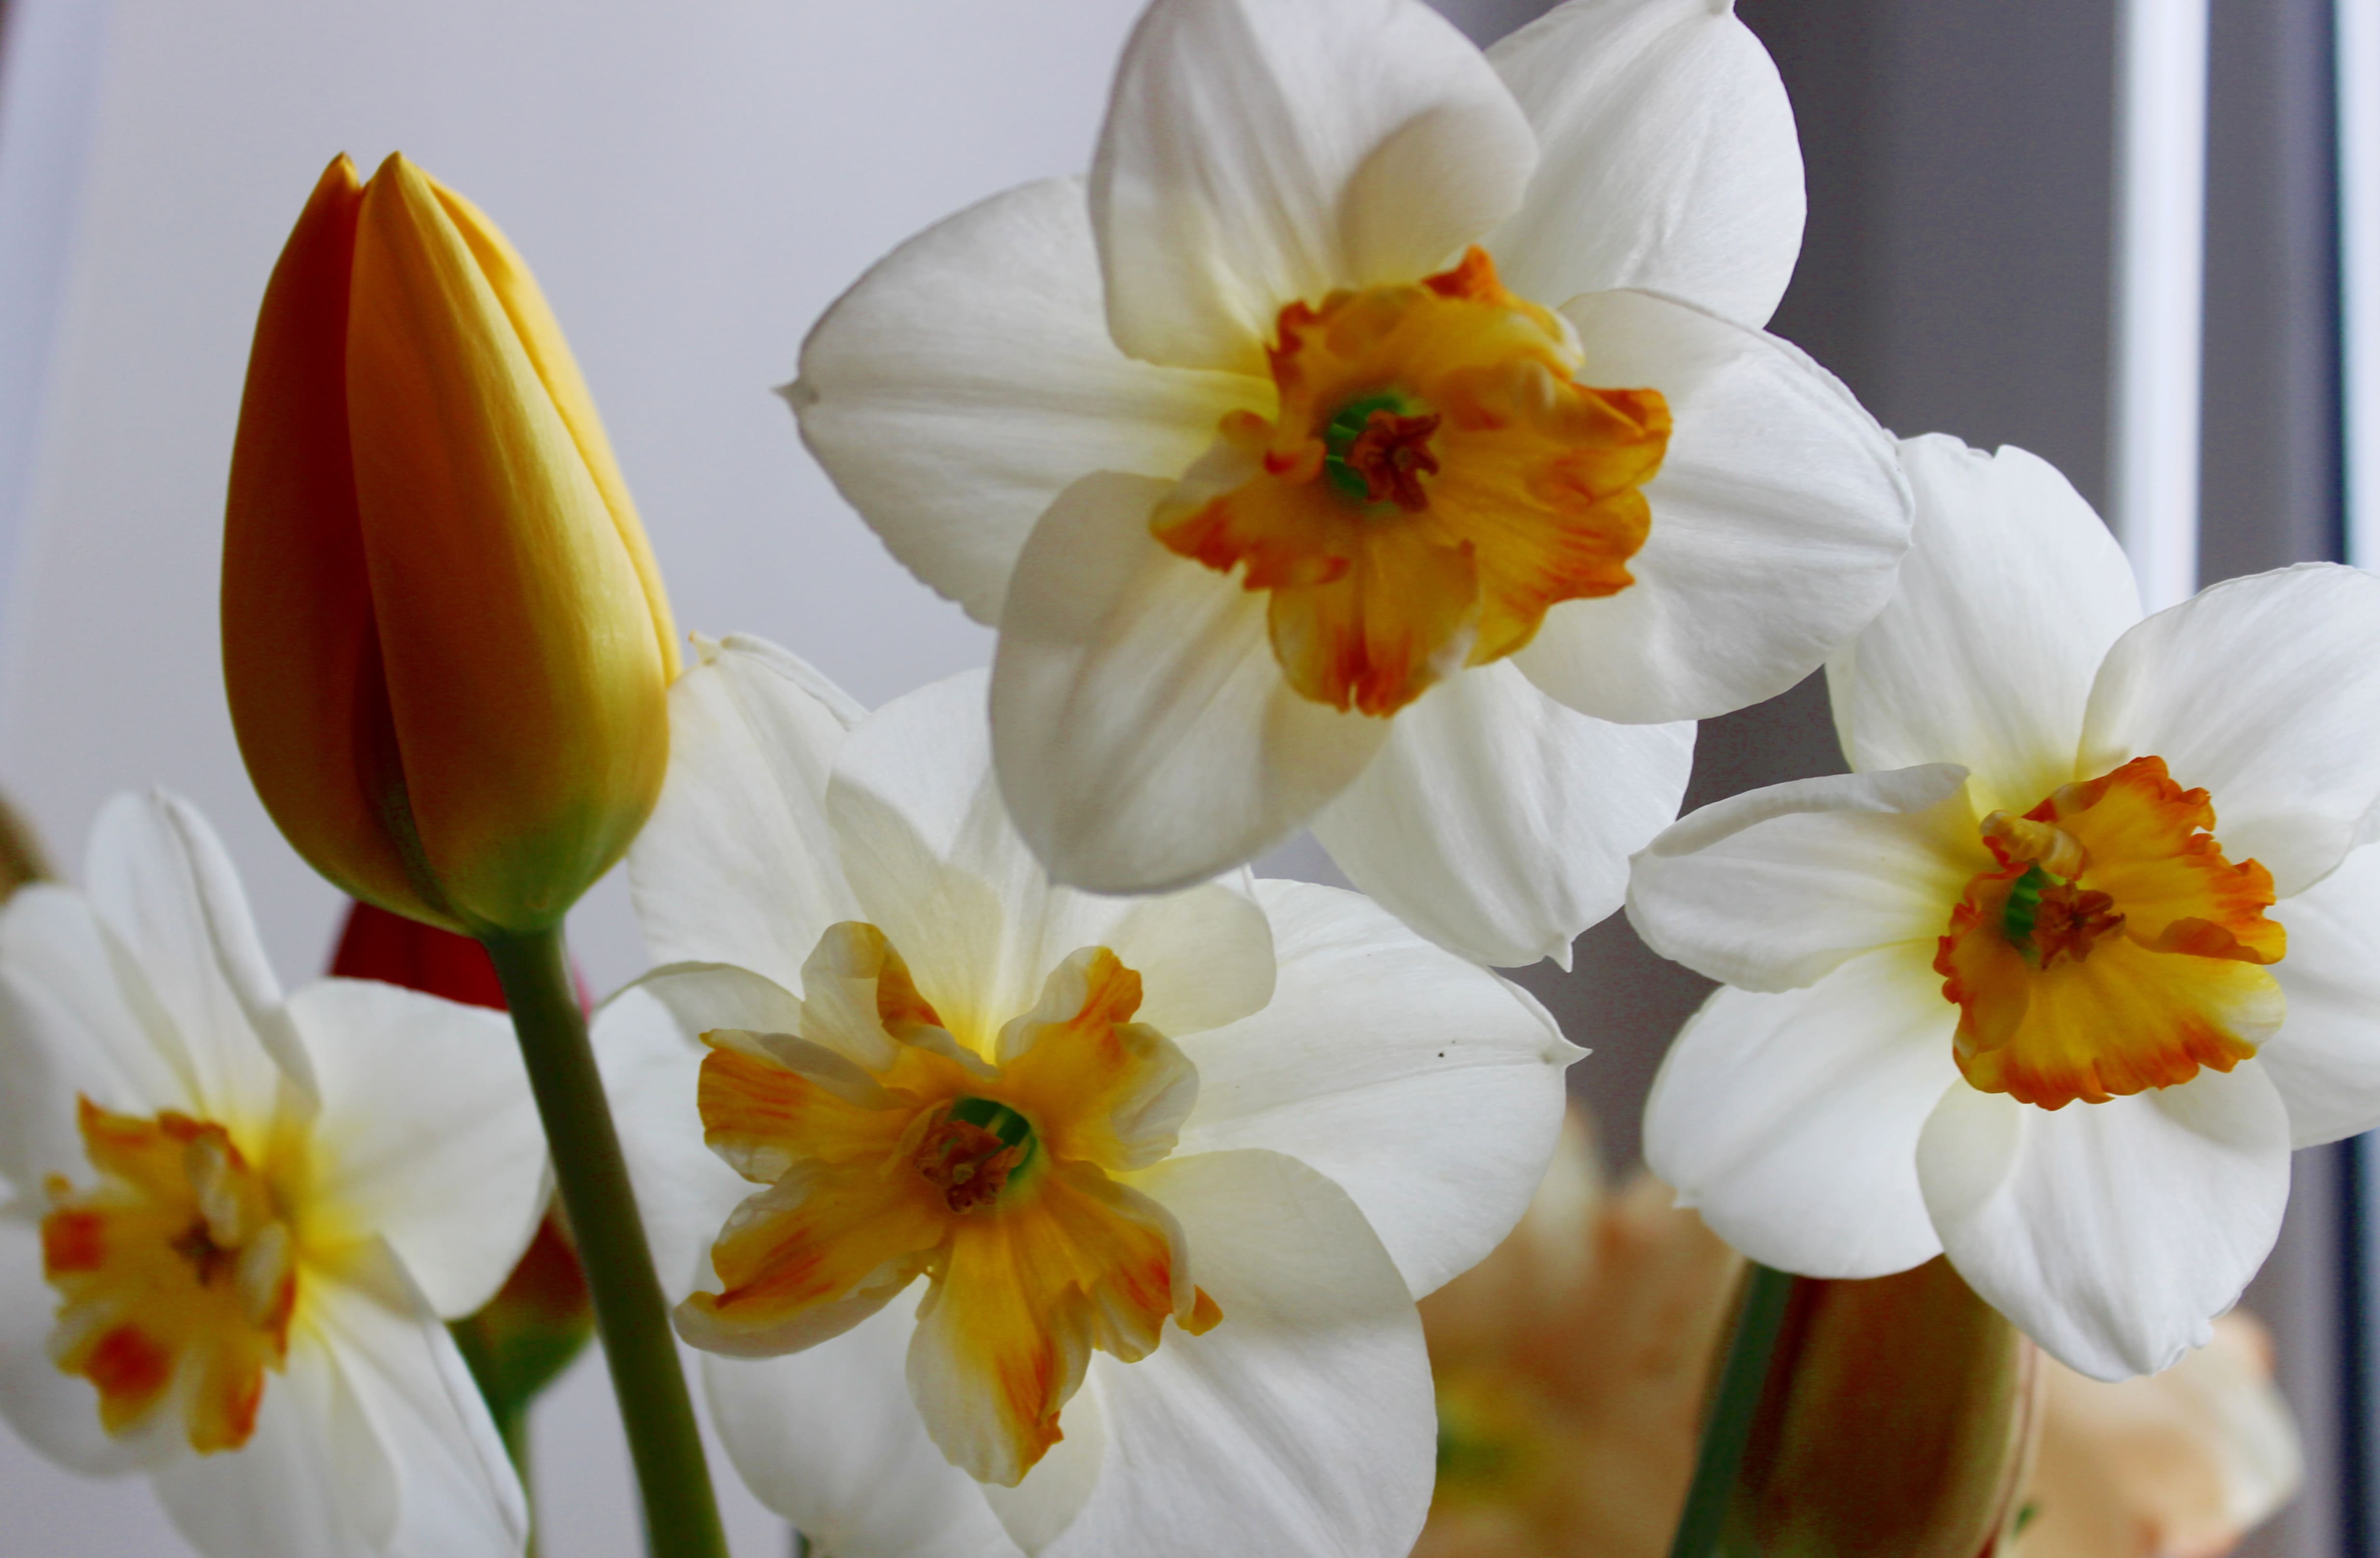 daffodils-photo-23